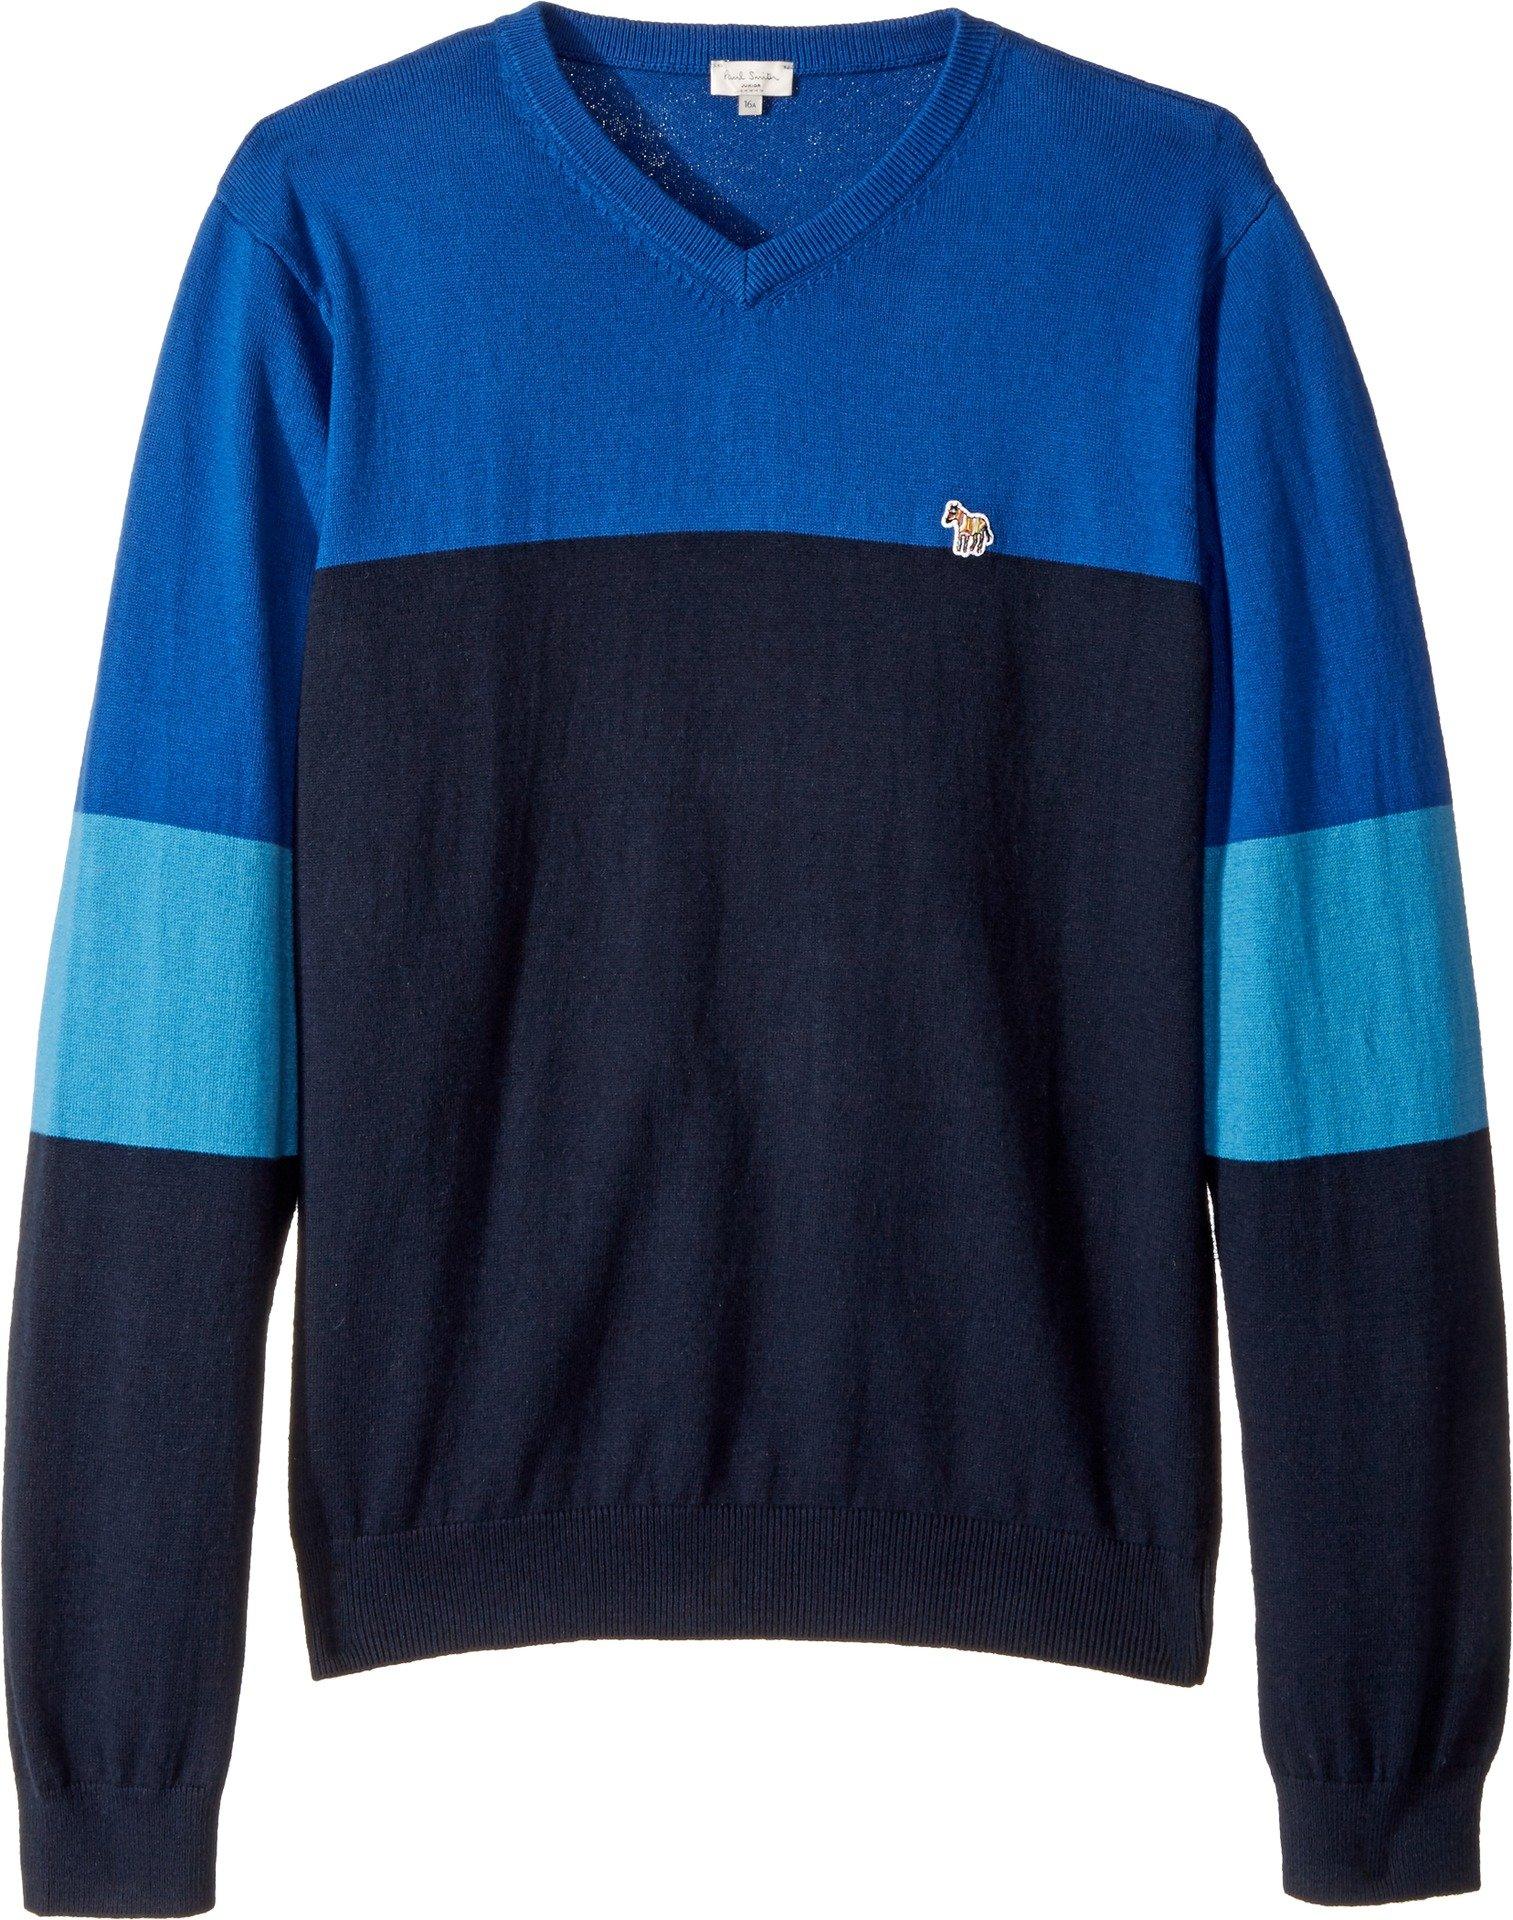 Paul Smith Junior Boy's V-Neck Color Block Sweater (Big Kids) Royal Blue 8 Big Kids